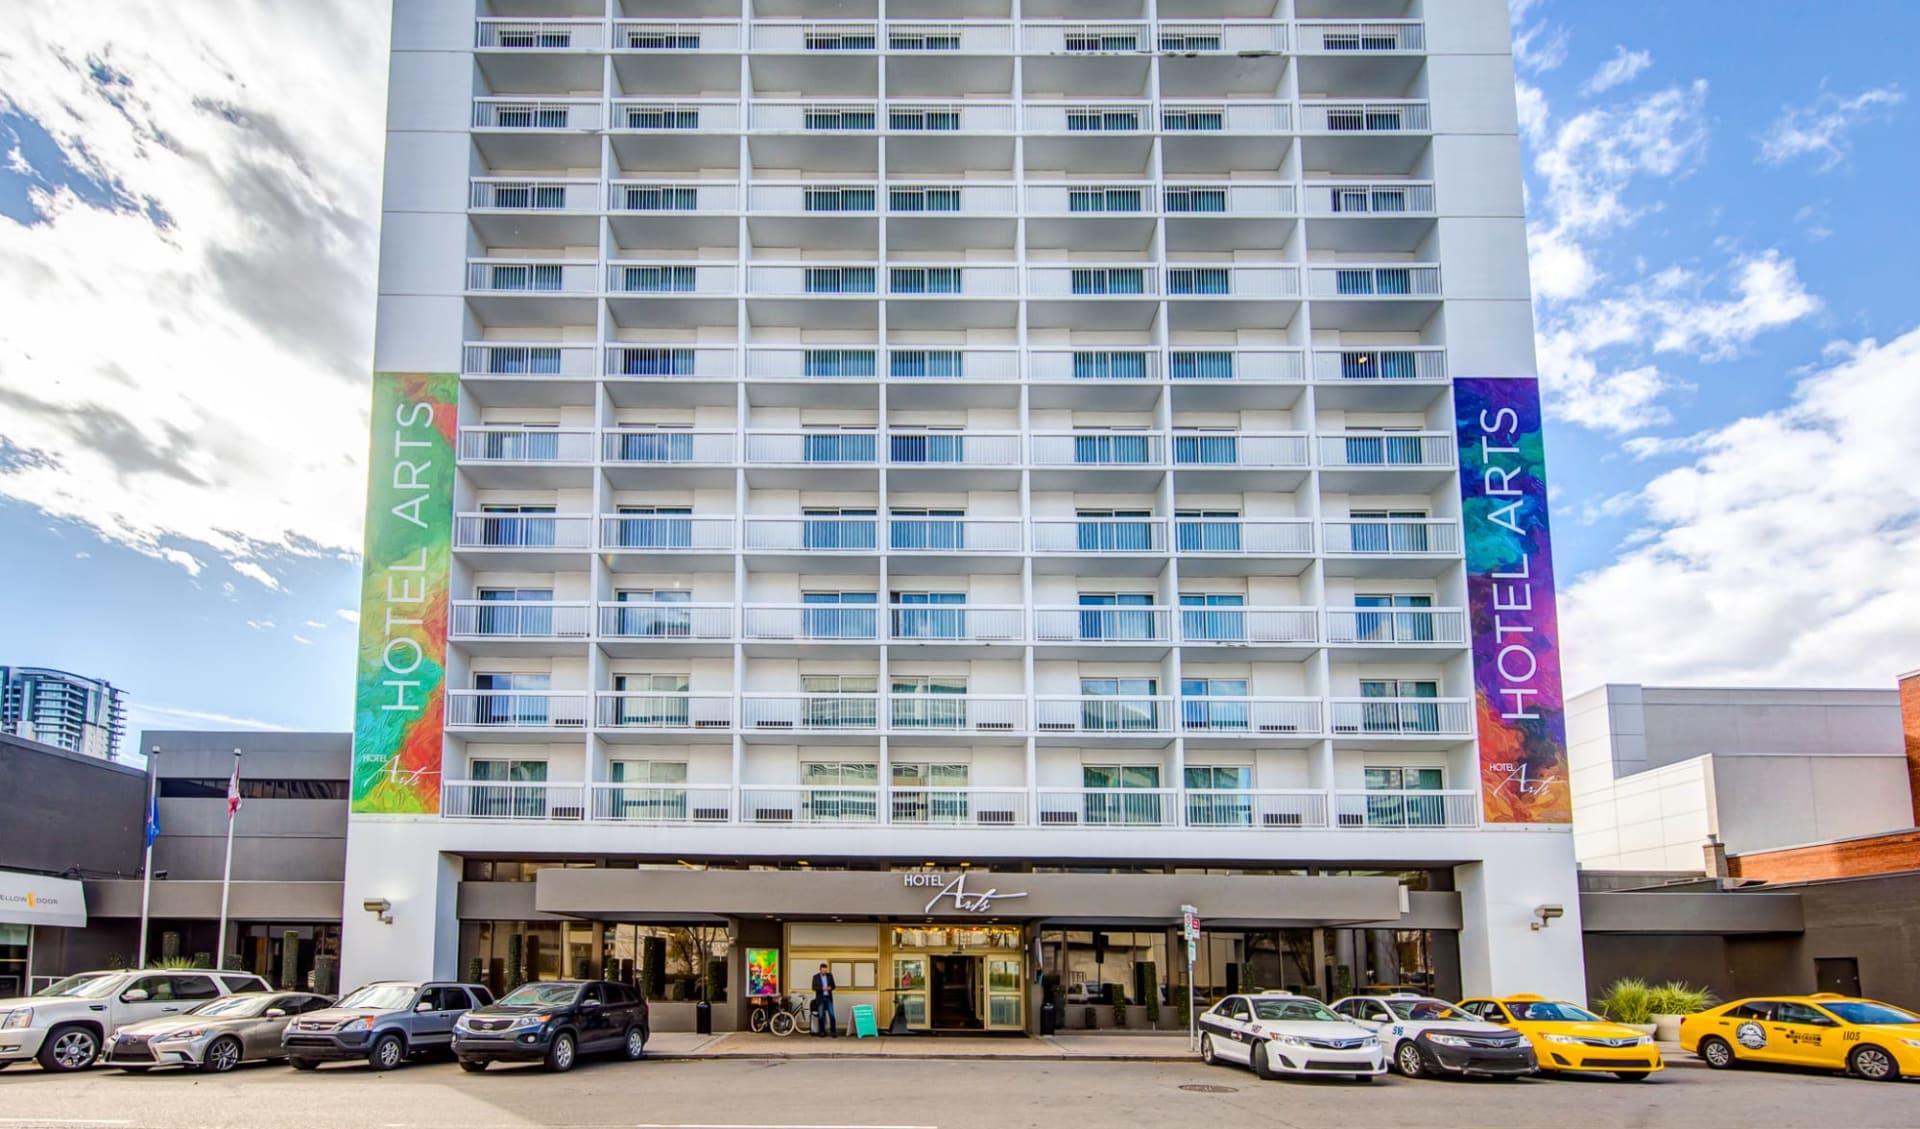 Hotel Arts in Calgary: Exterior_Arts Hotel YYC_Aussenansicht_Jonview